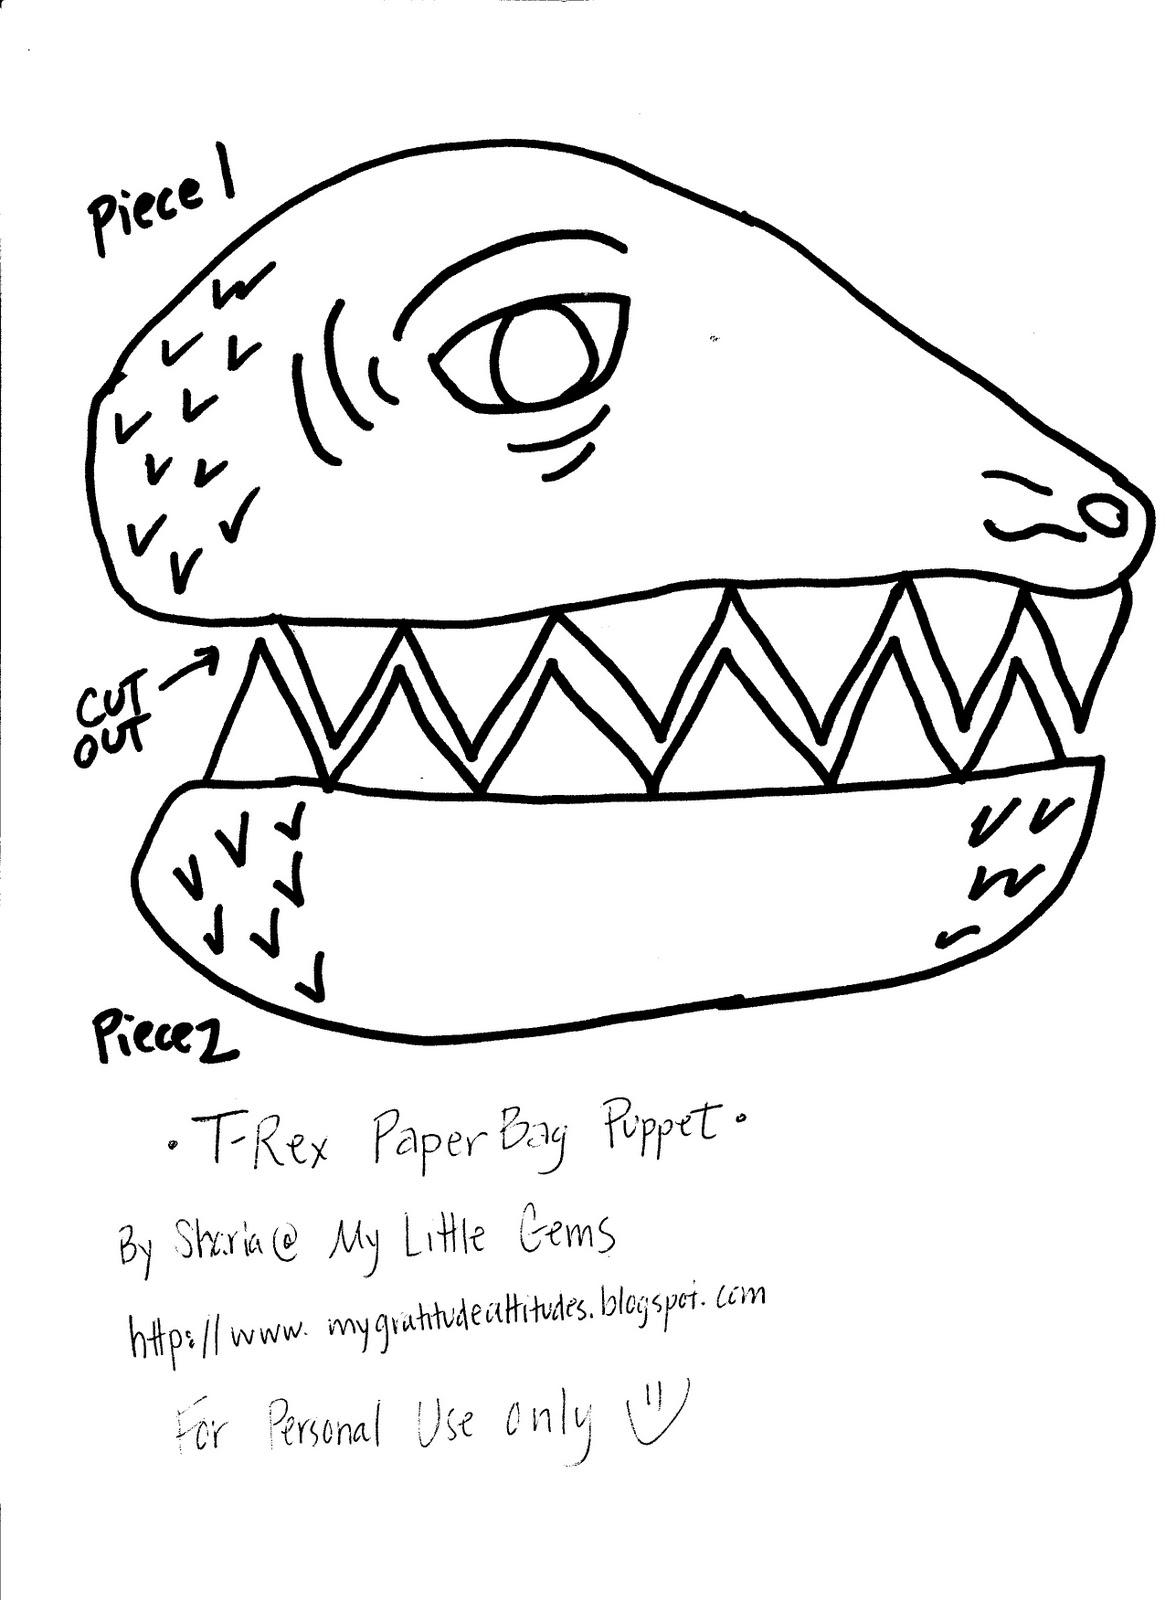 My Little Gems Dinosaur Activities For Preschoolers And